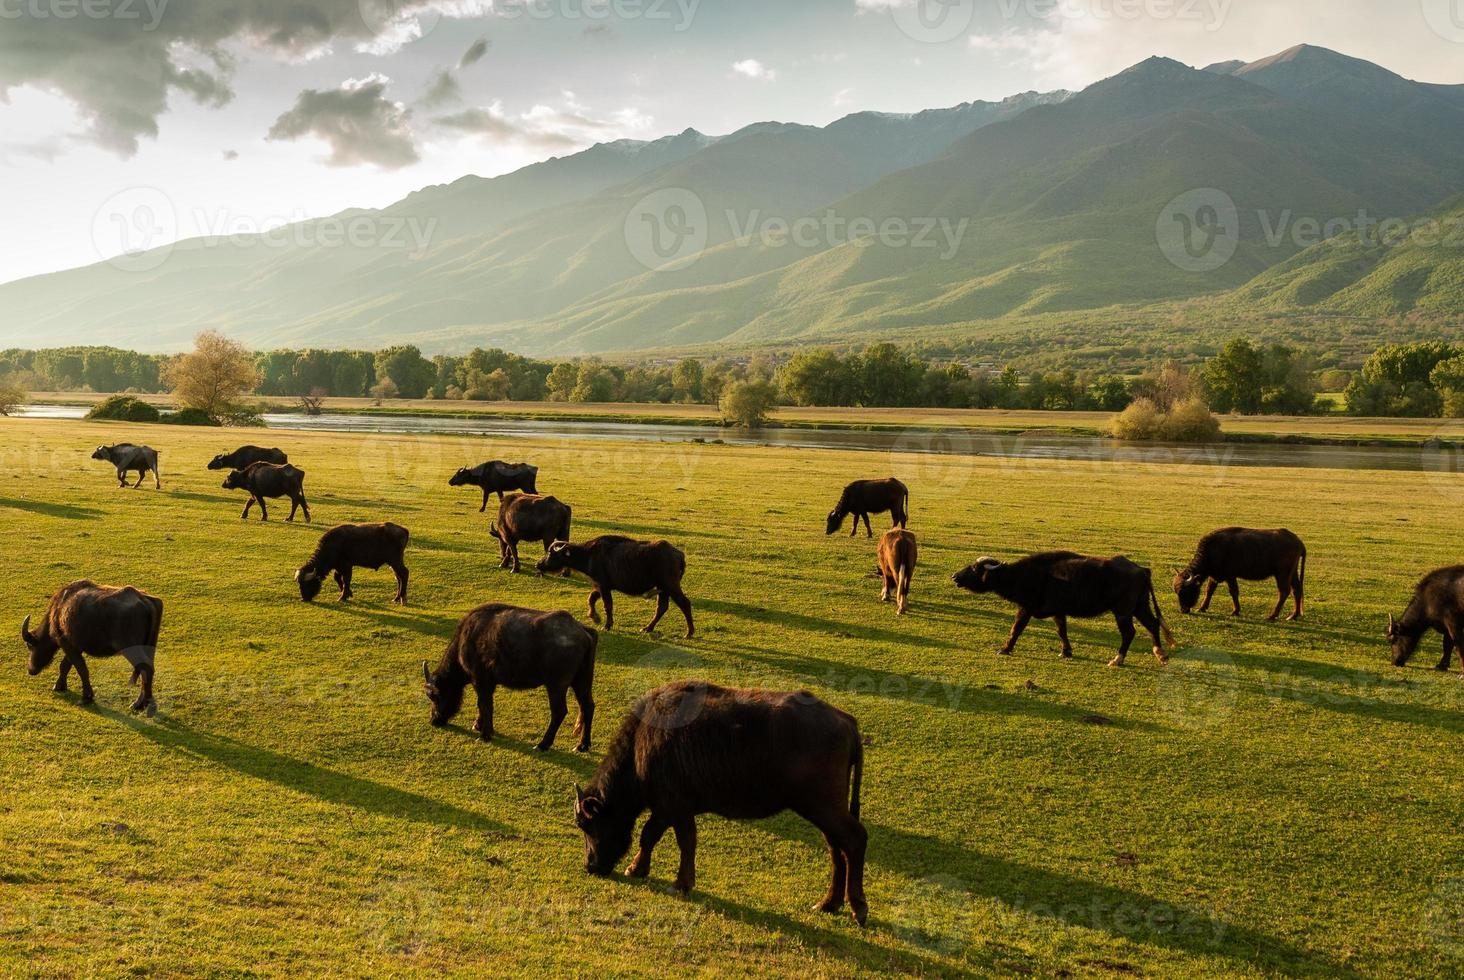 Buffaloes in Greece photo